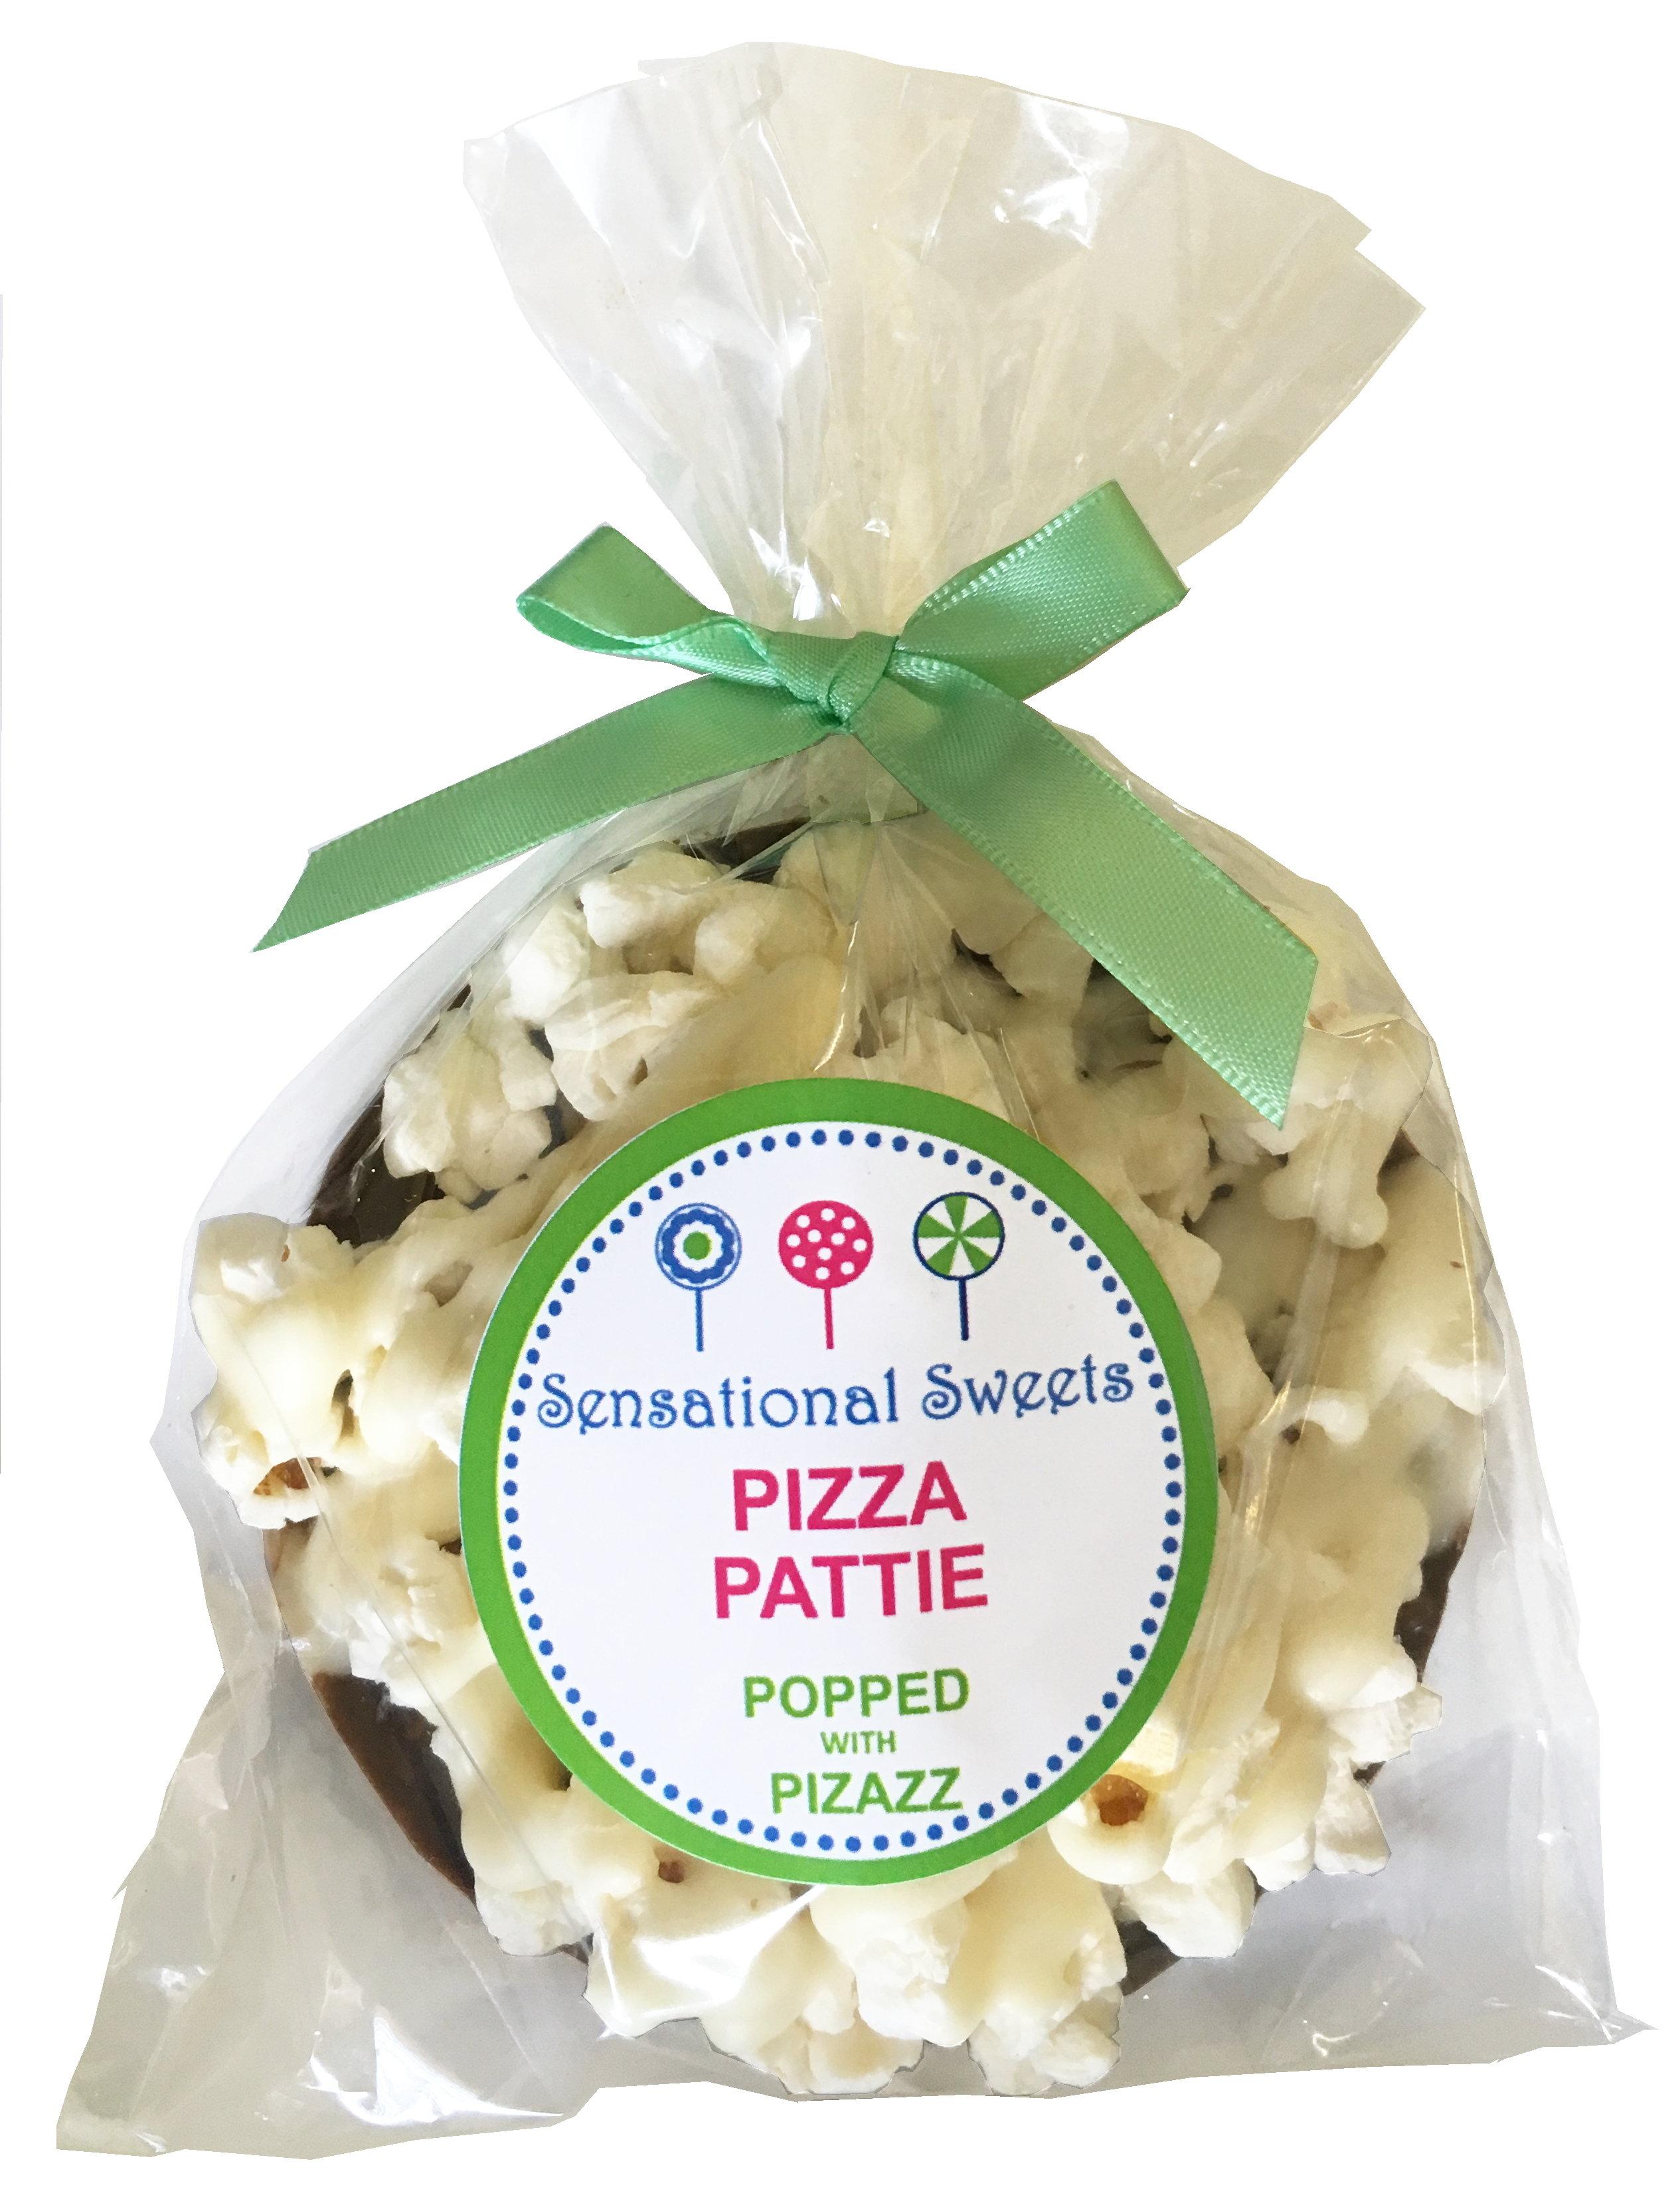 Gourmet Chocolate Pizza Pattie w/white drizzle no decorations (Shown w/LP Label) PZPW